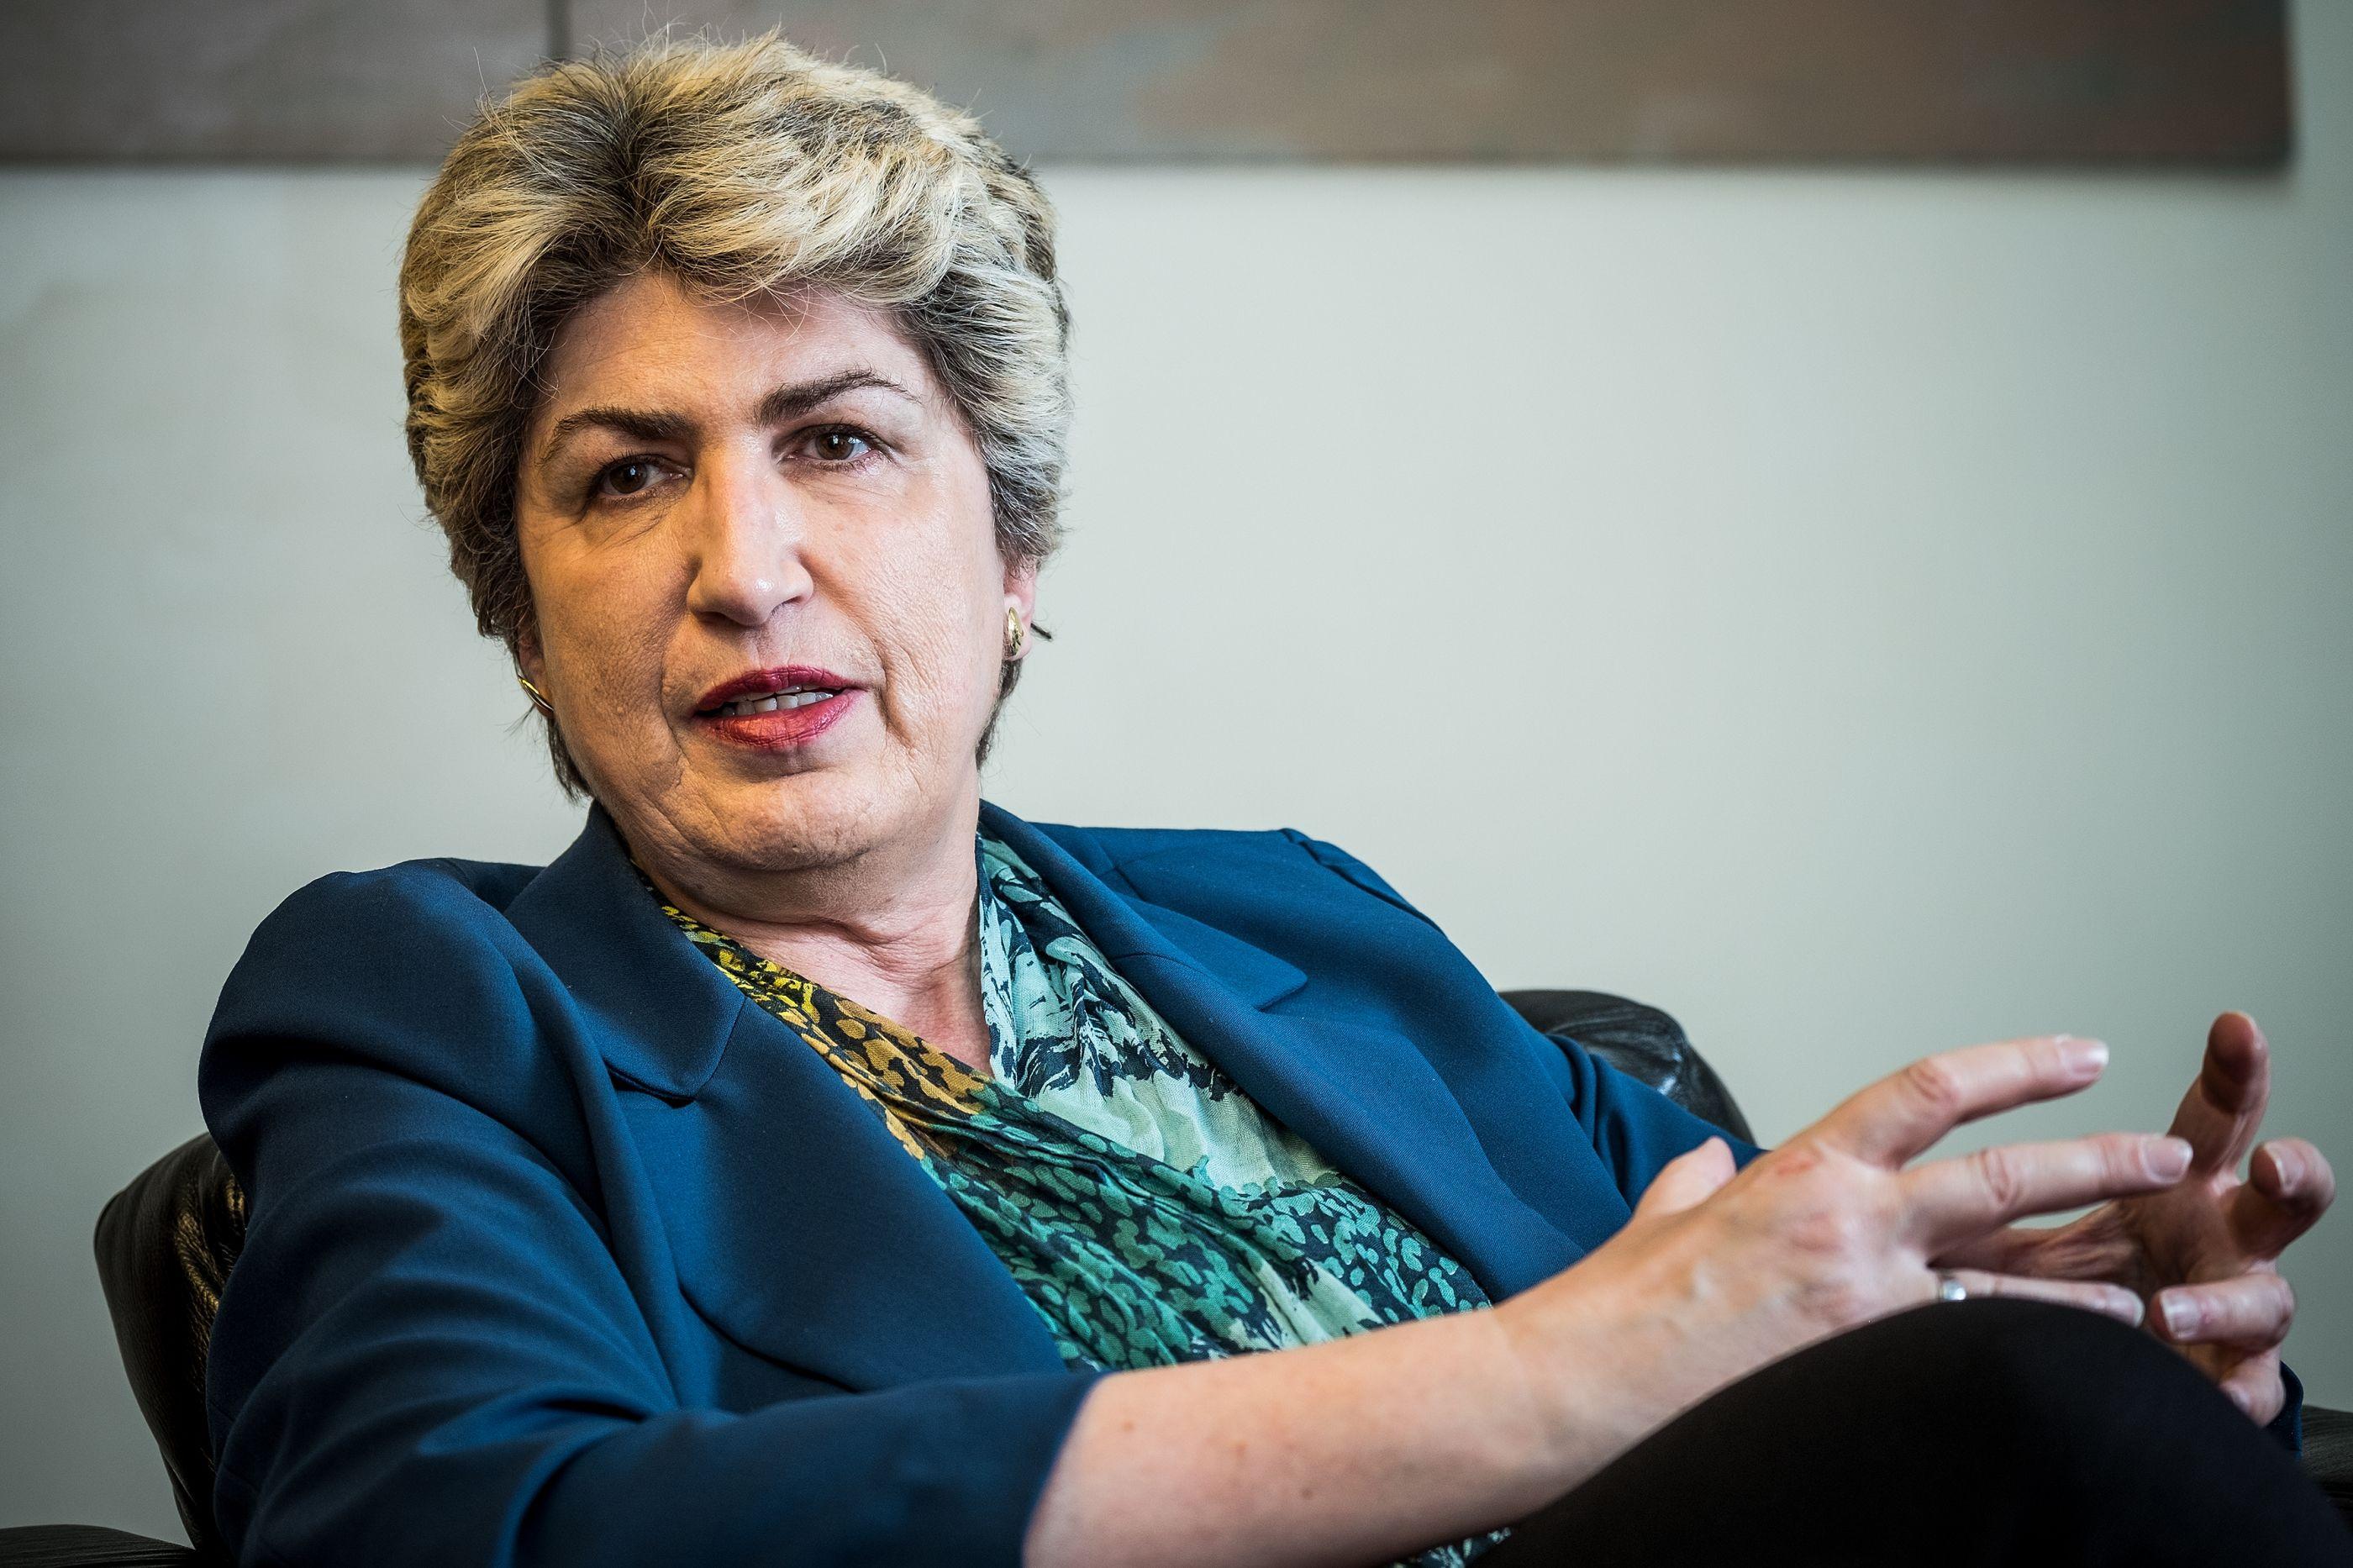 Maria João Rodrigues sancionada por assédio moral no Parlamento Europeu